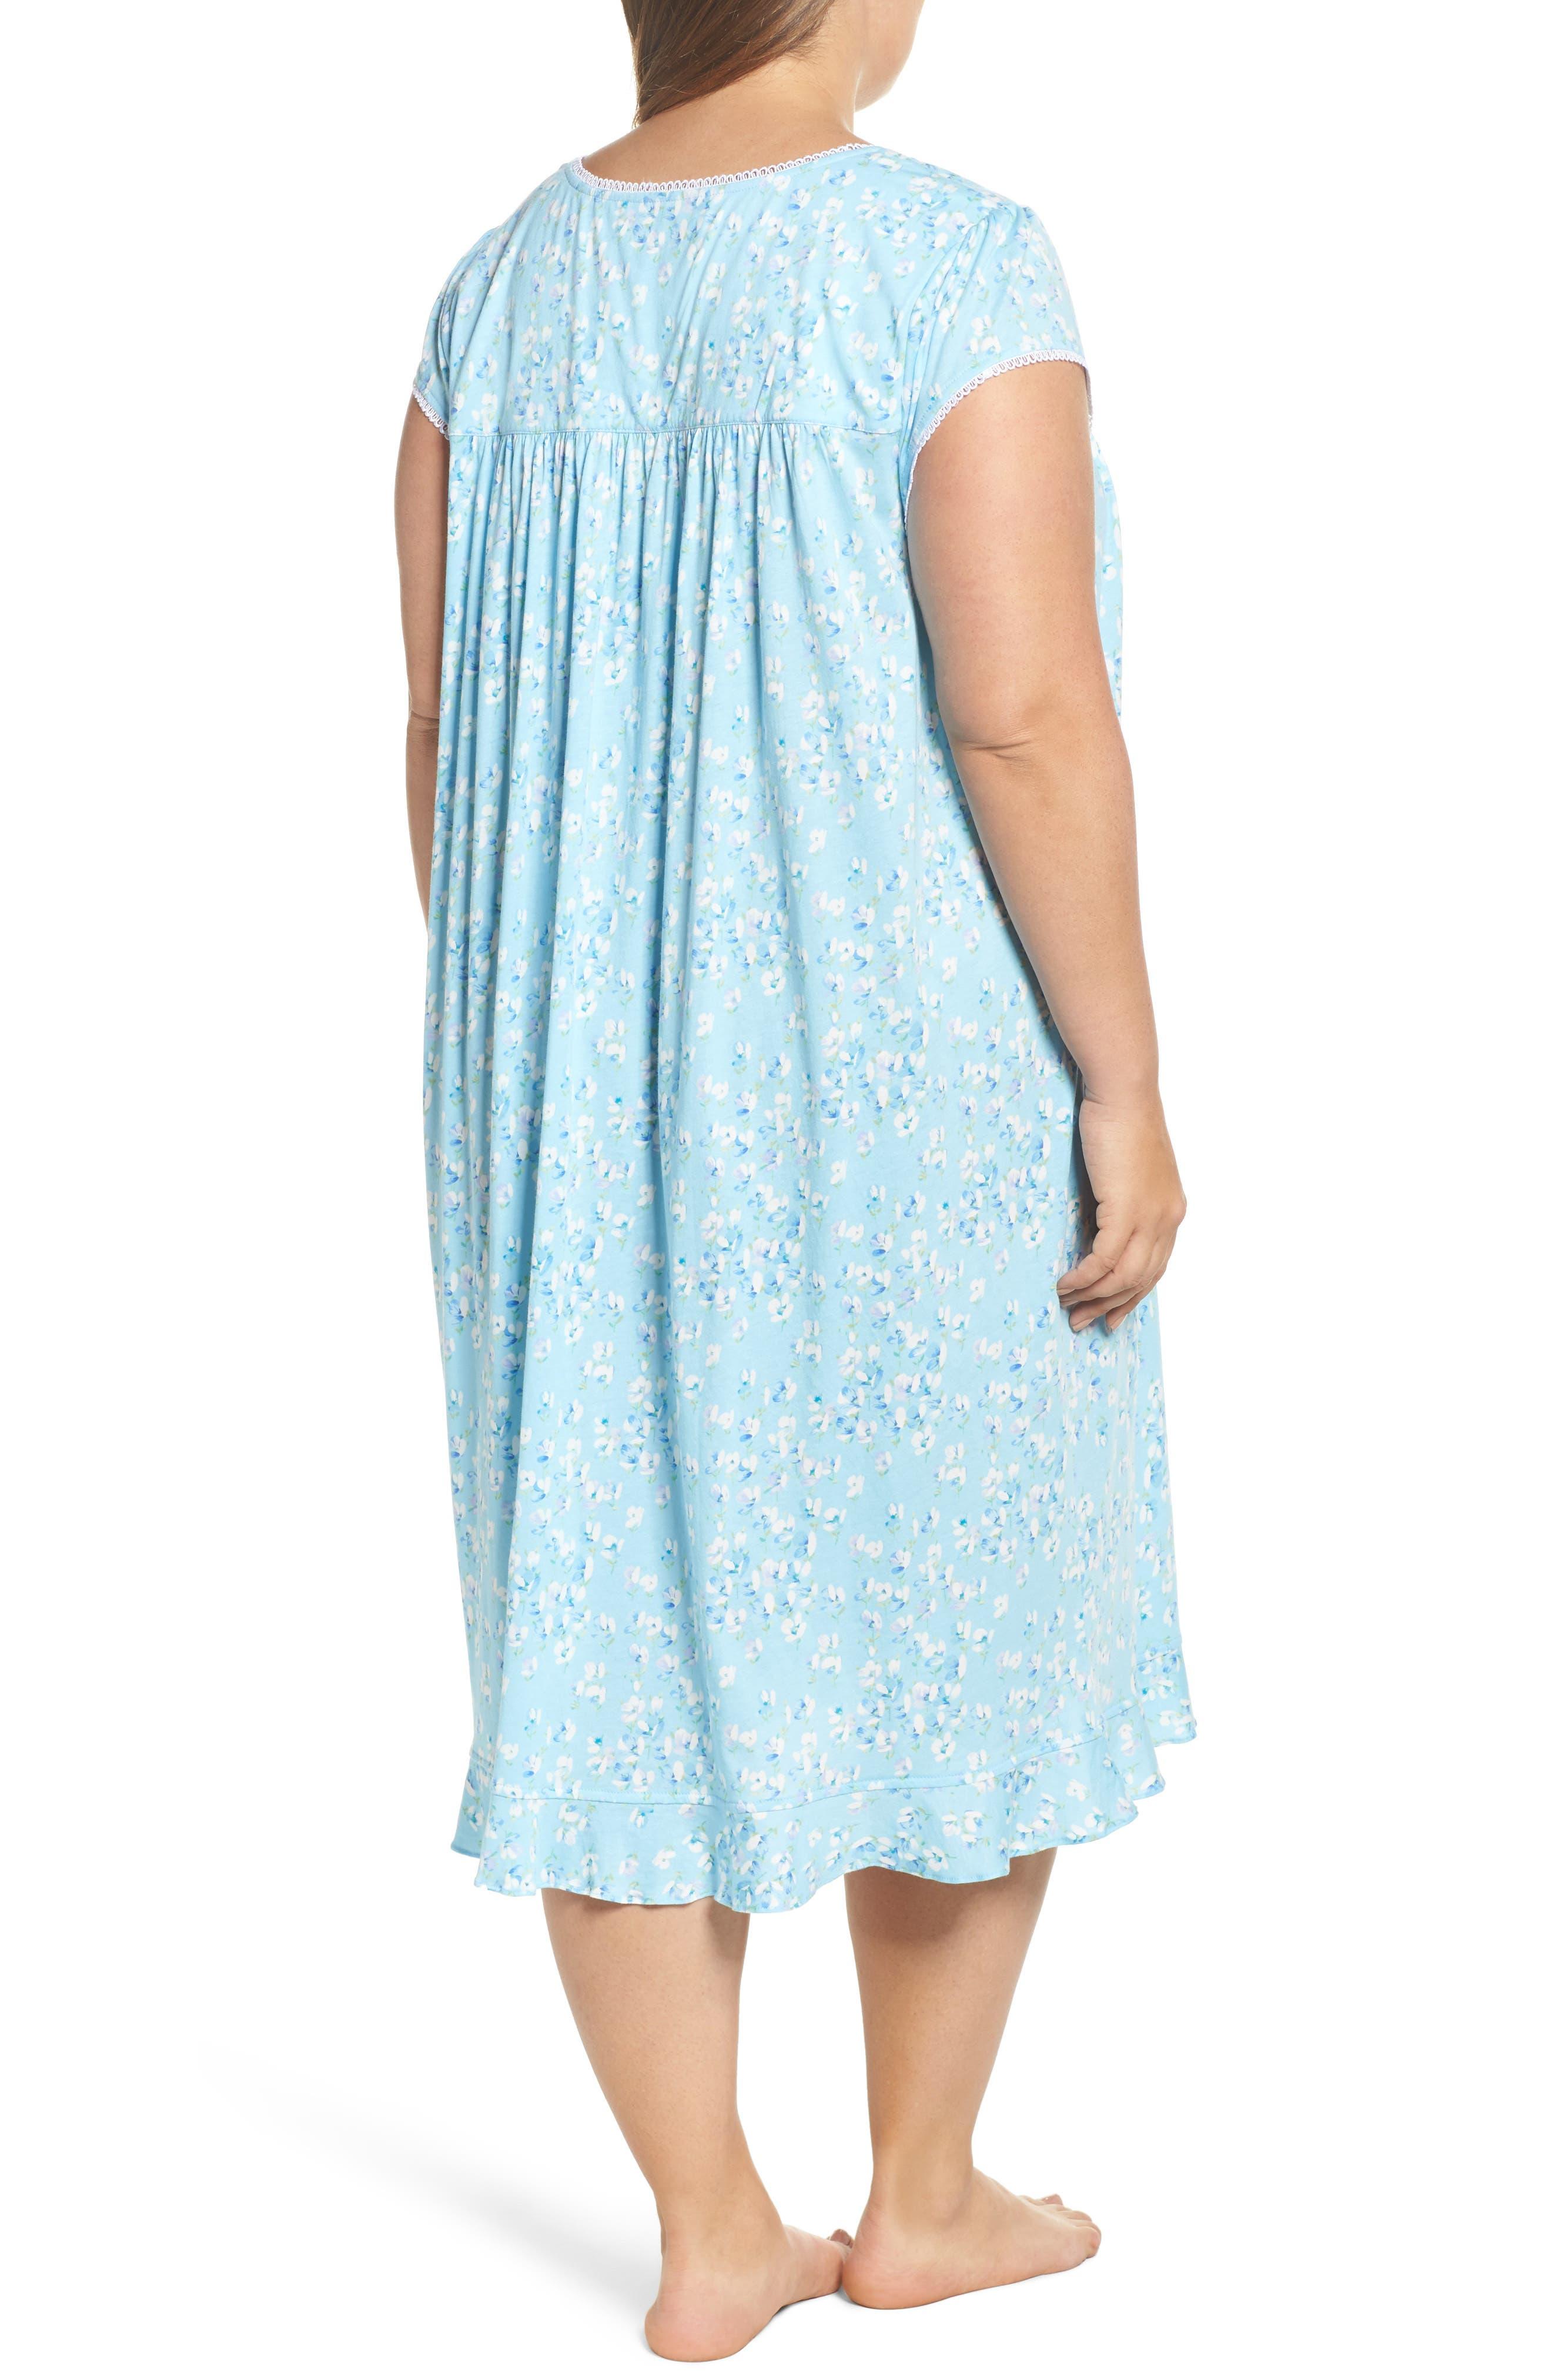 Waltz Nightgown,                             Alternate thumbnail 2, color,                             Light Sea Glass/ Multi Floral